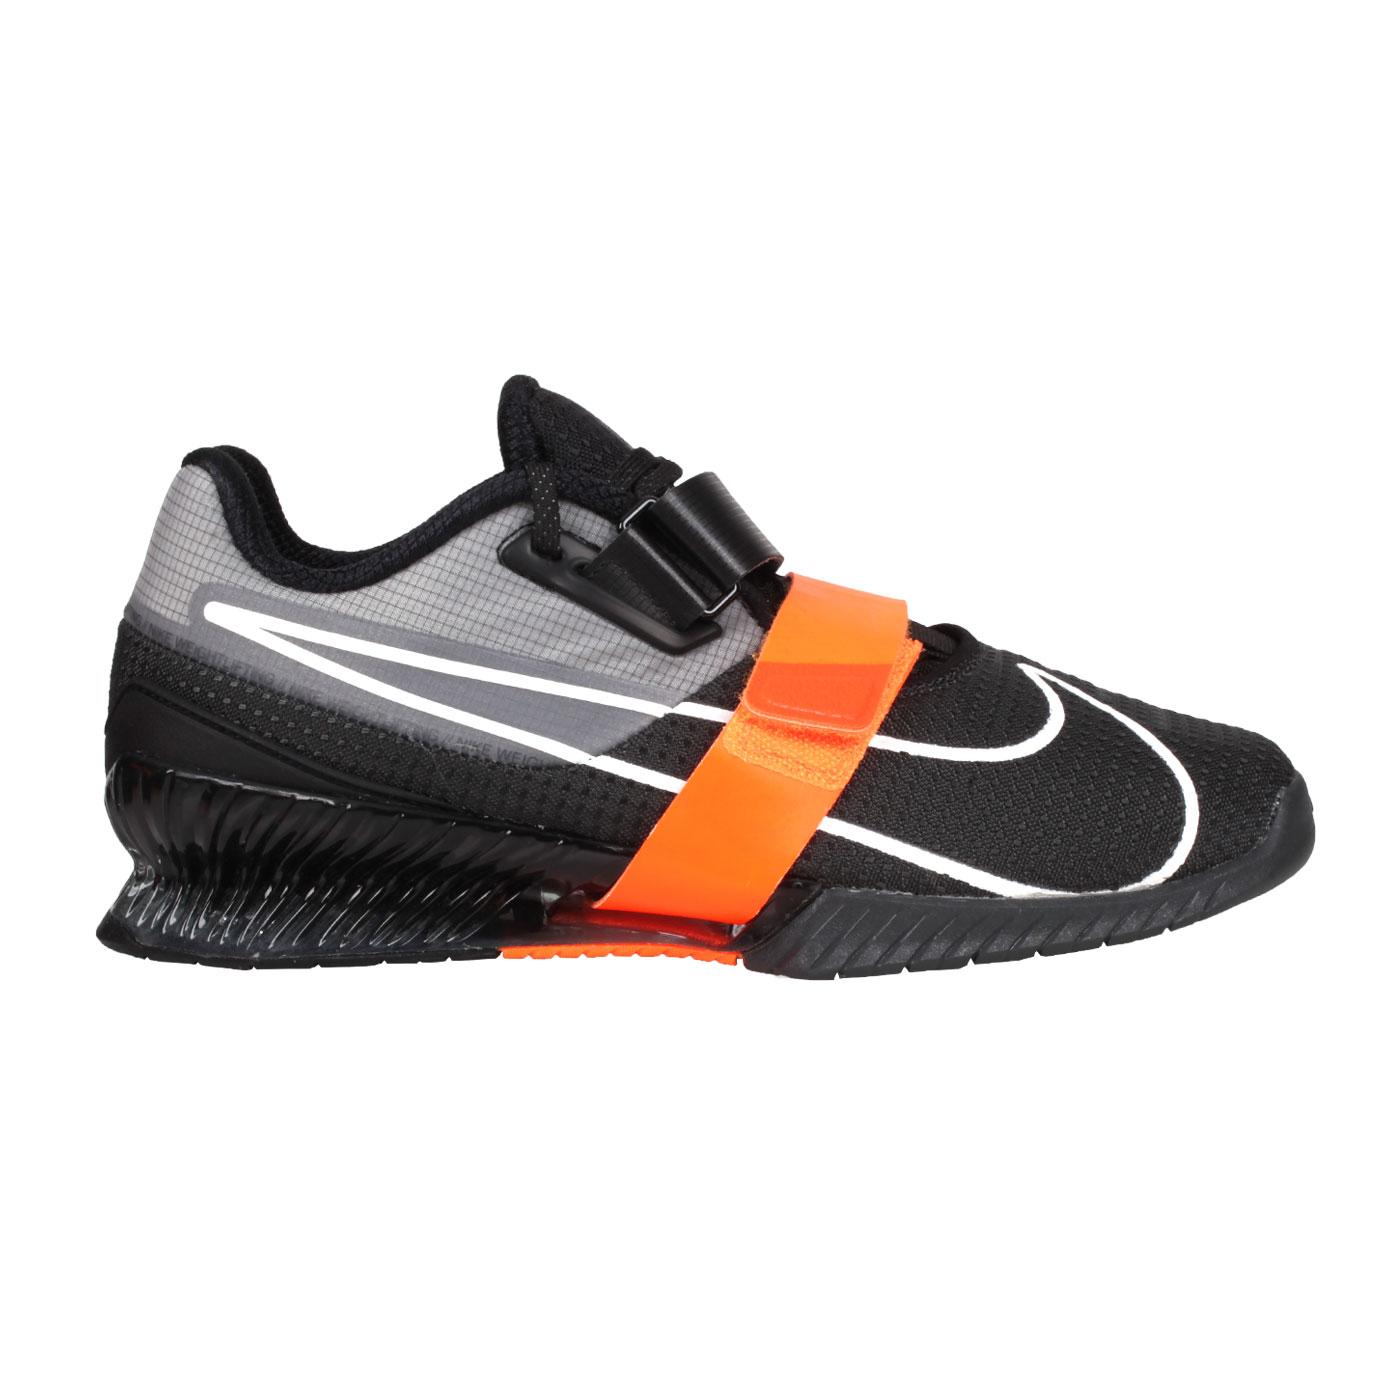 NIKE 舉重鞋  @ ROMALEOS 4@CD3463018 - 黑灰白亮橘